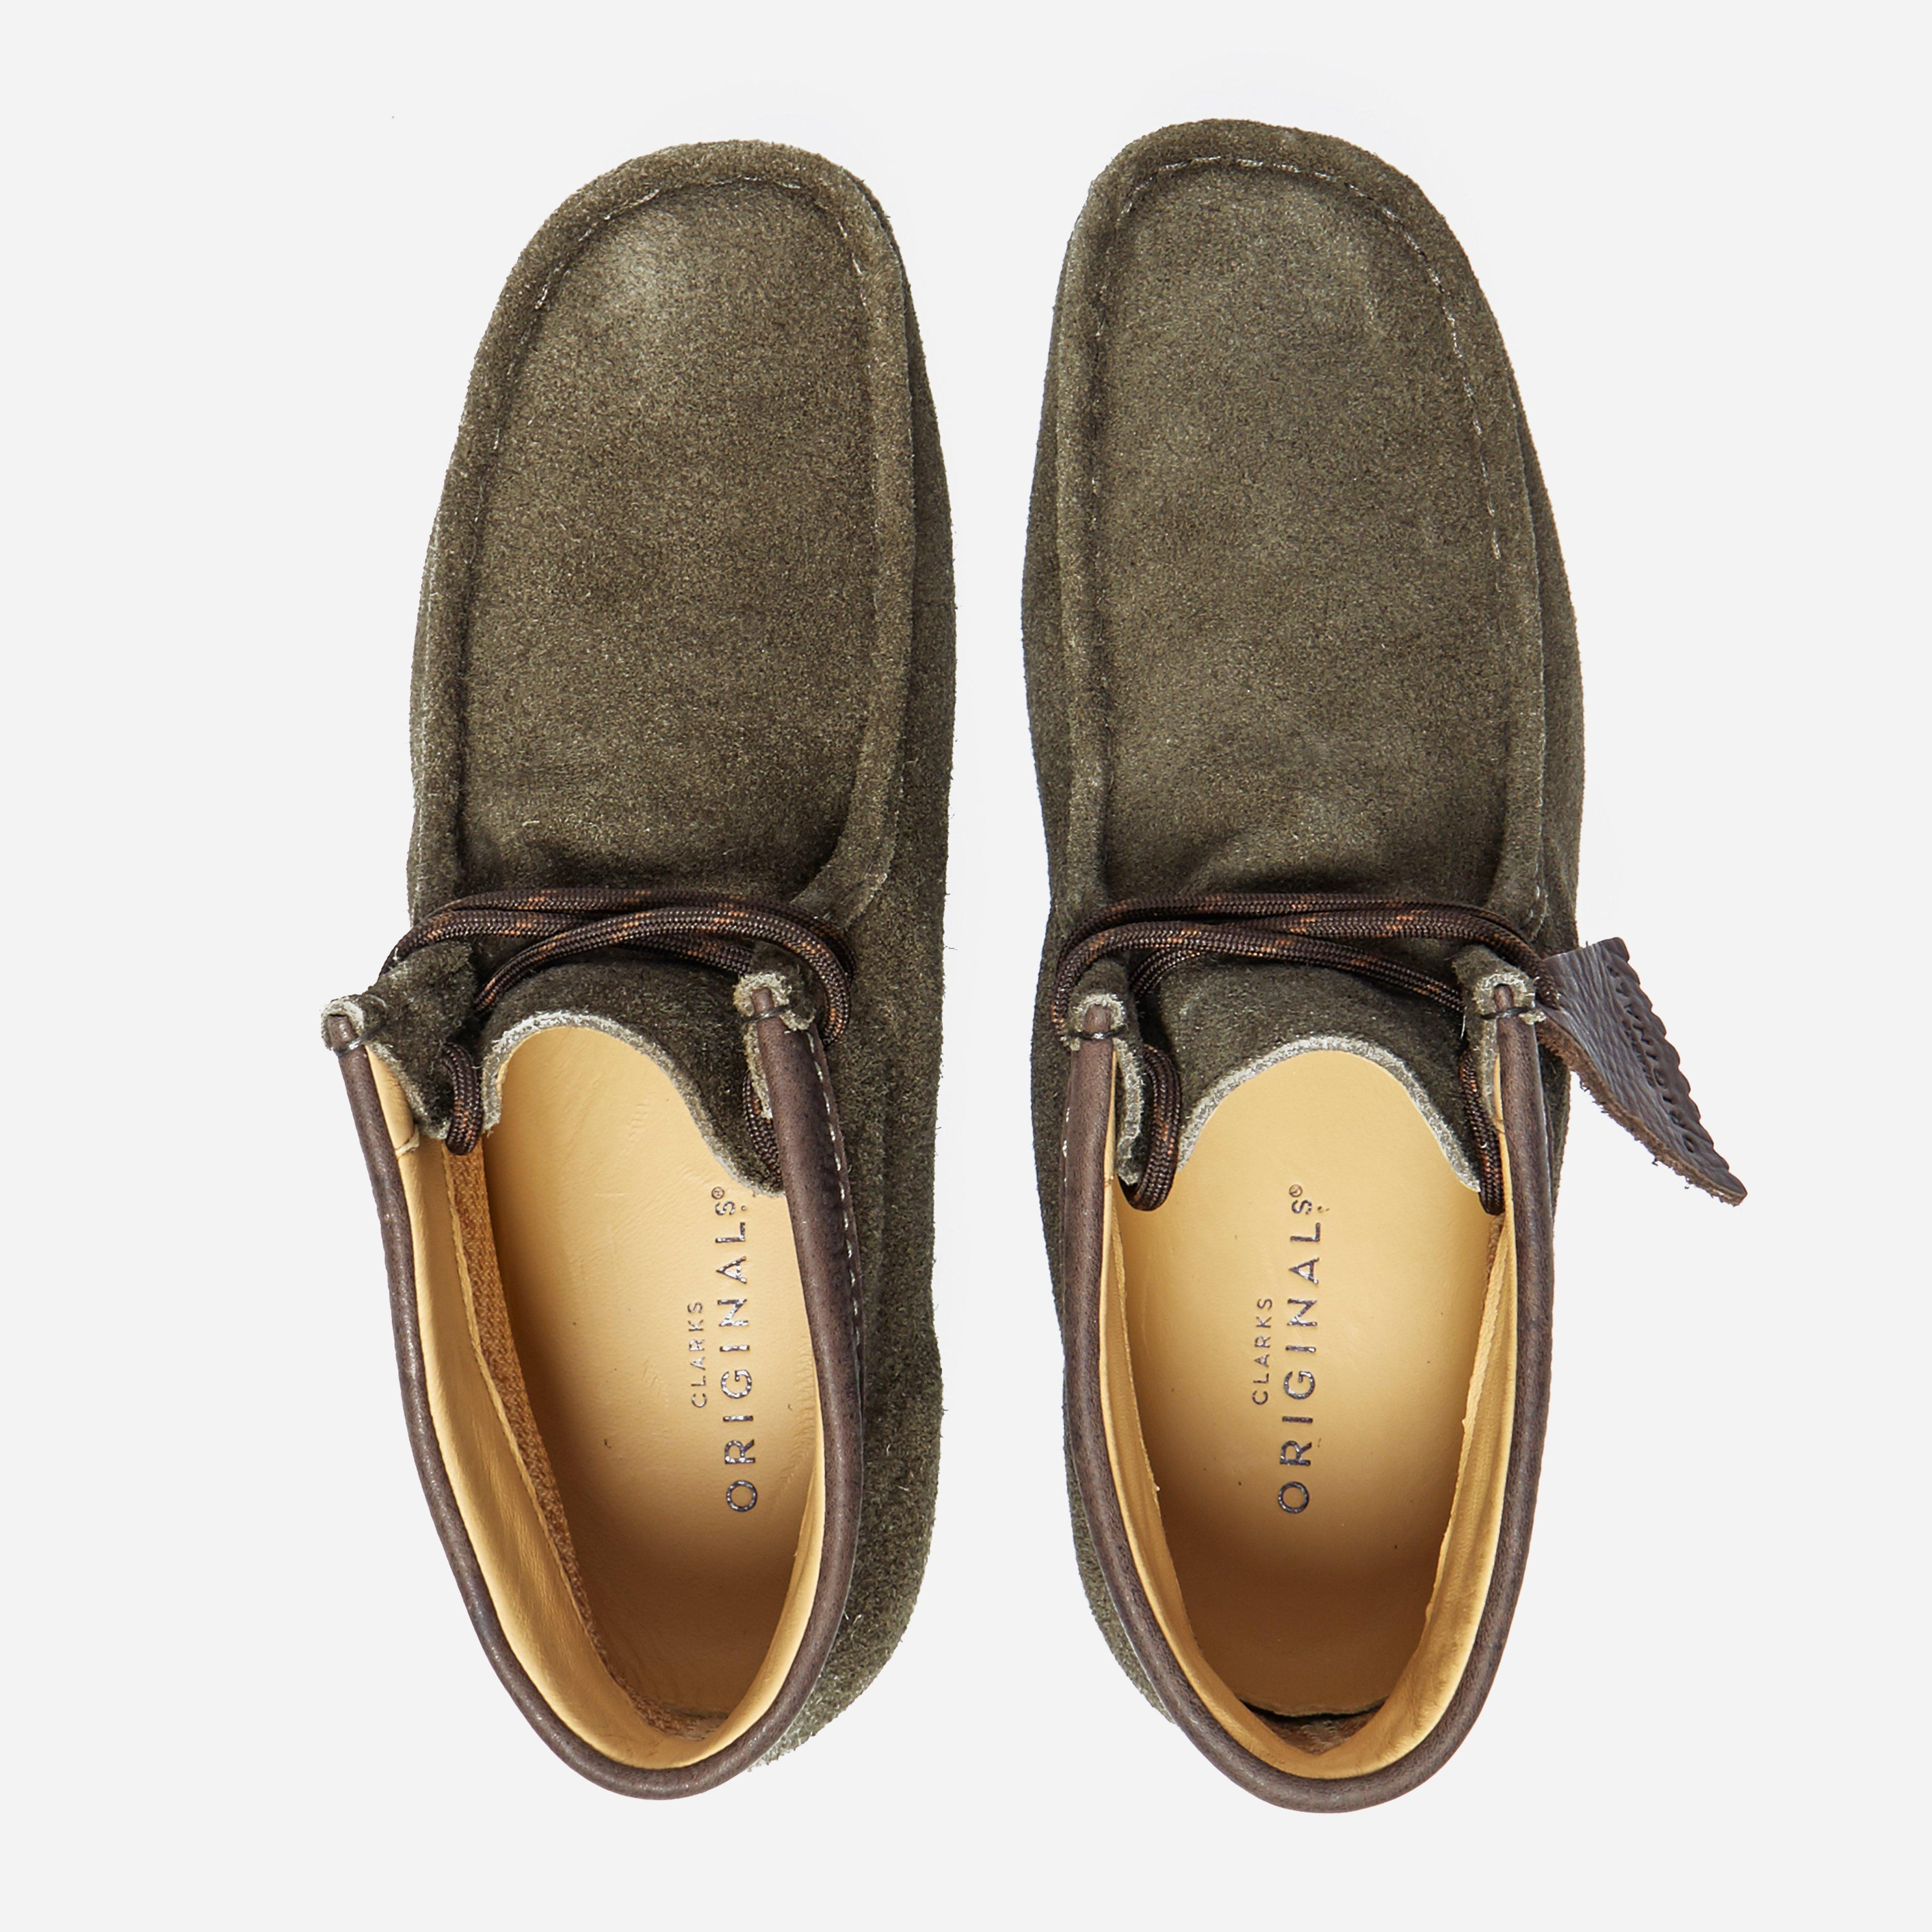 Clarks Hip Wedge Shoe Boot